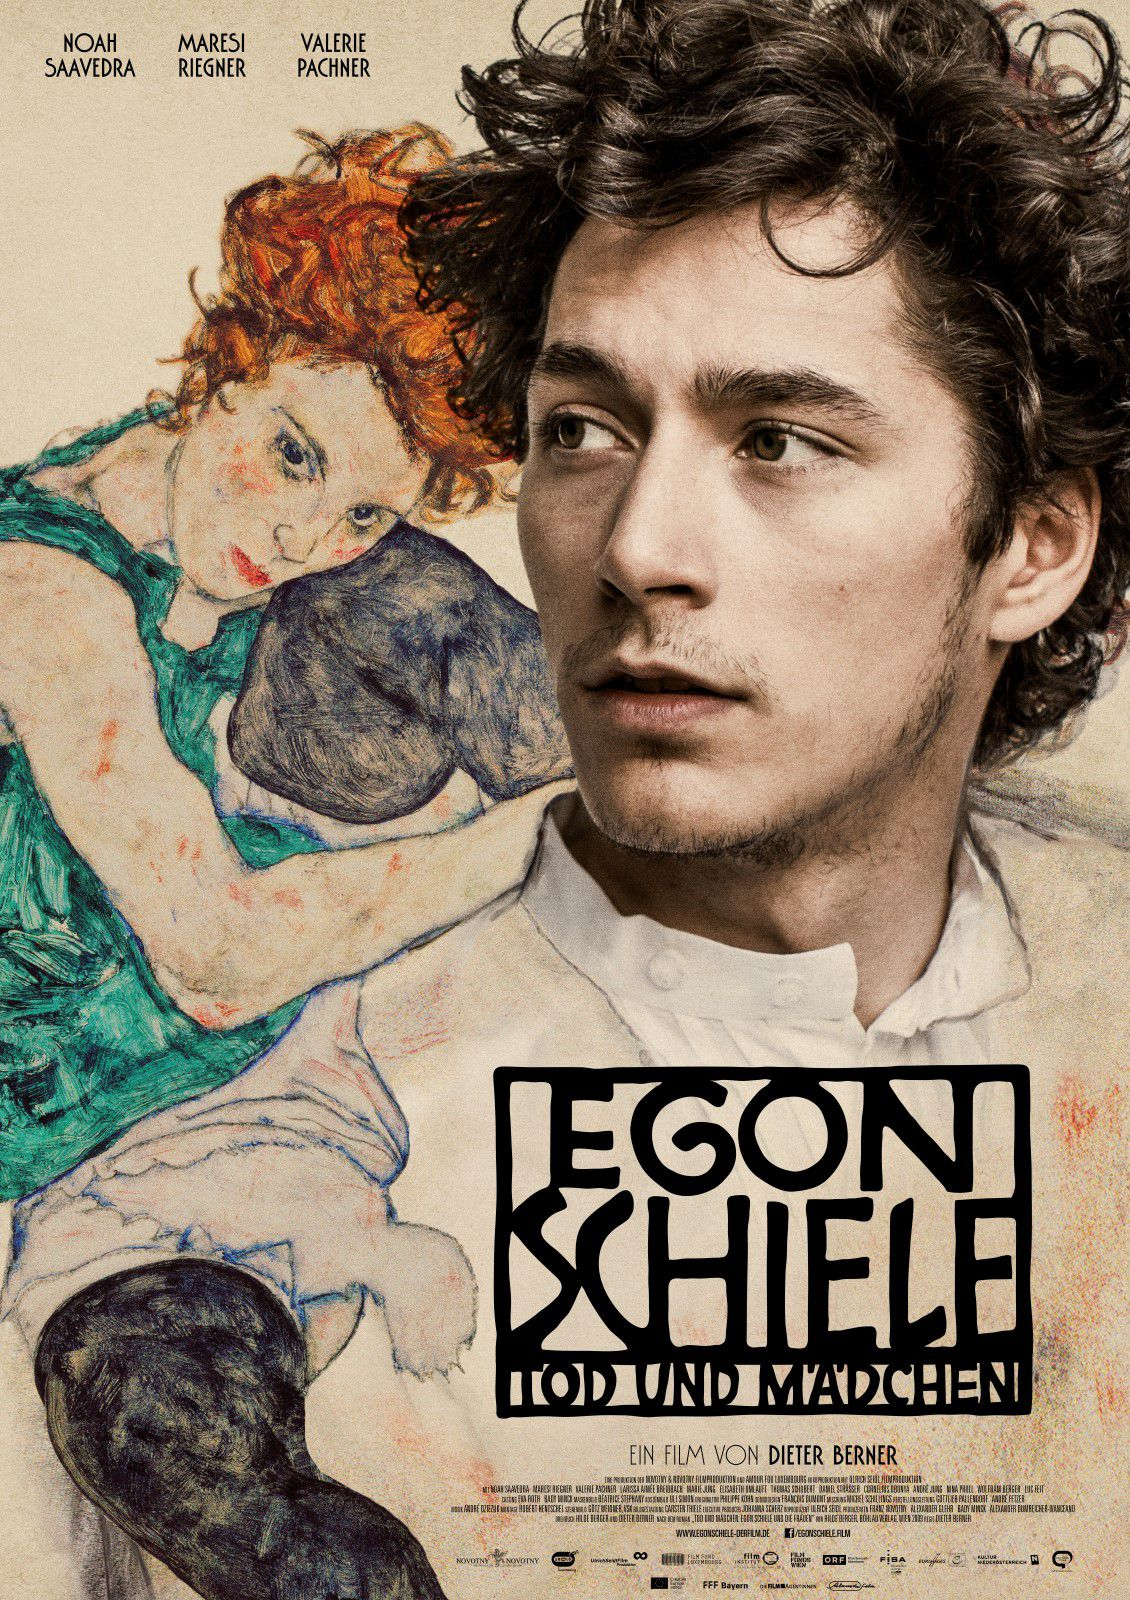 Egon Schiele - Film (2016)